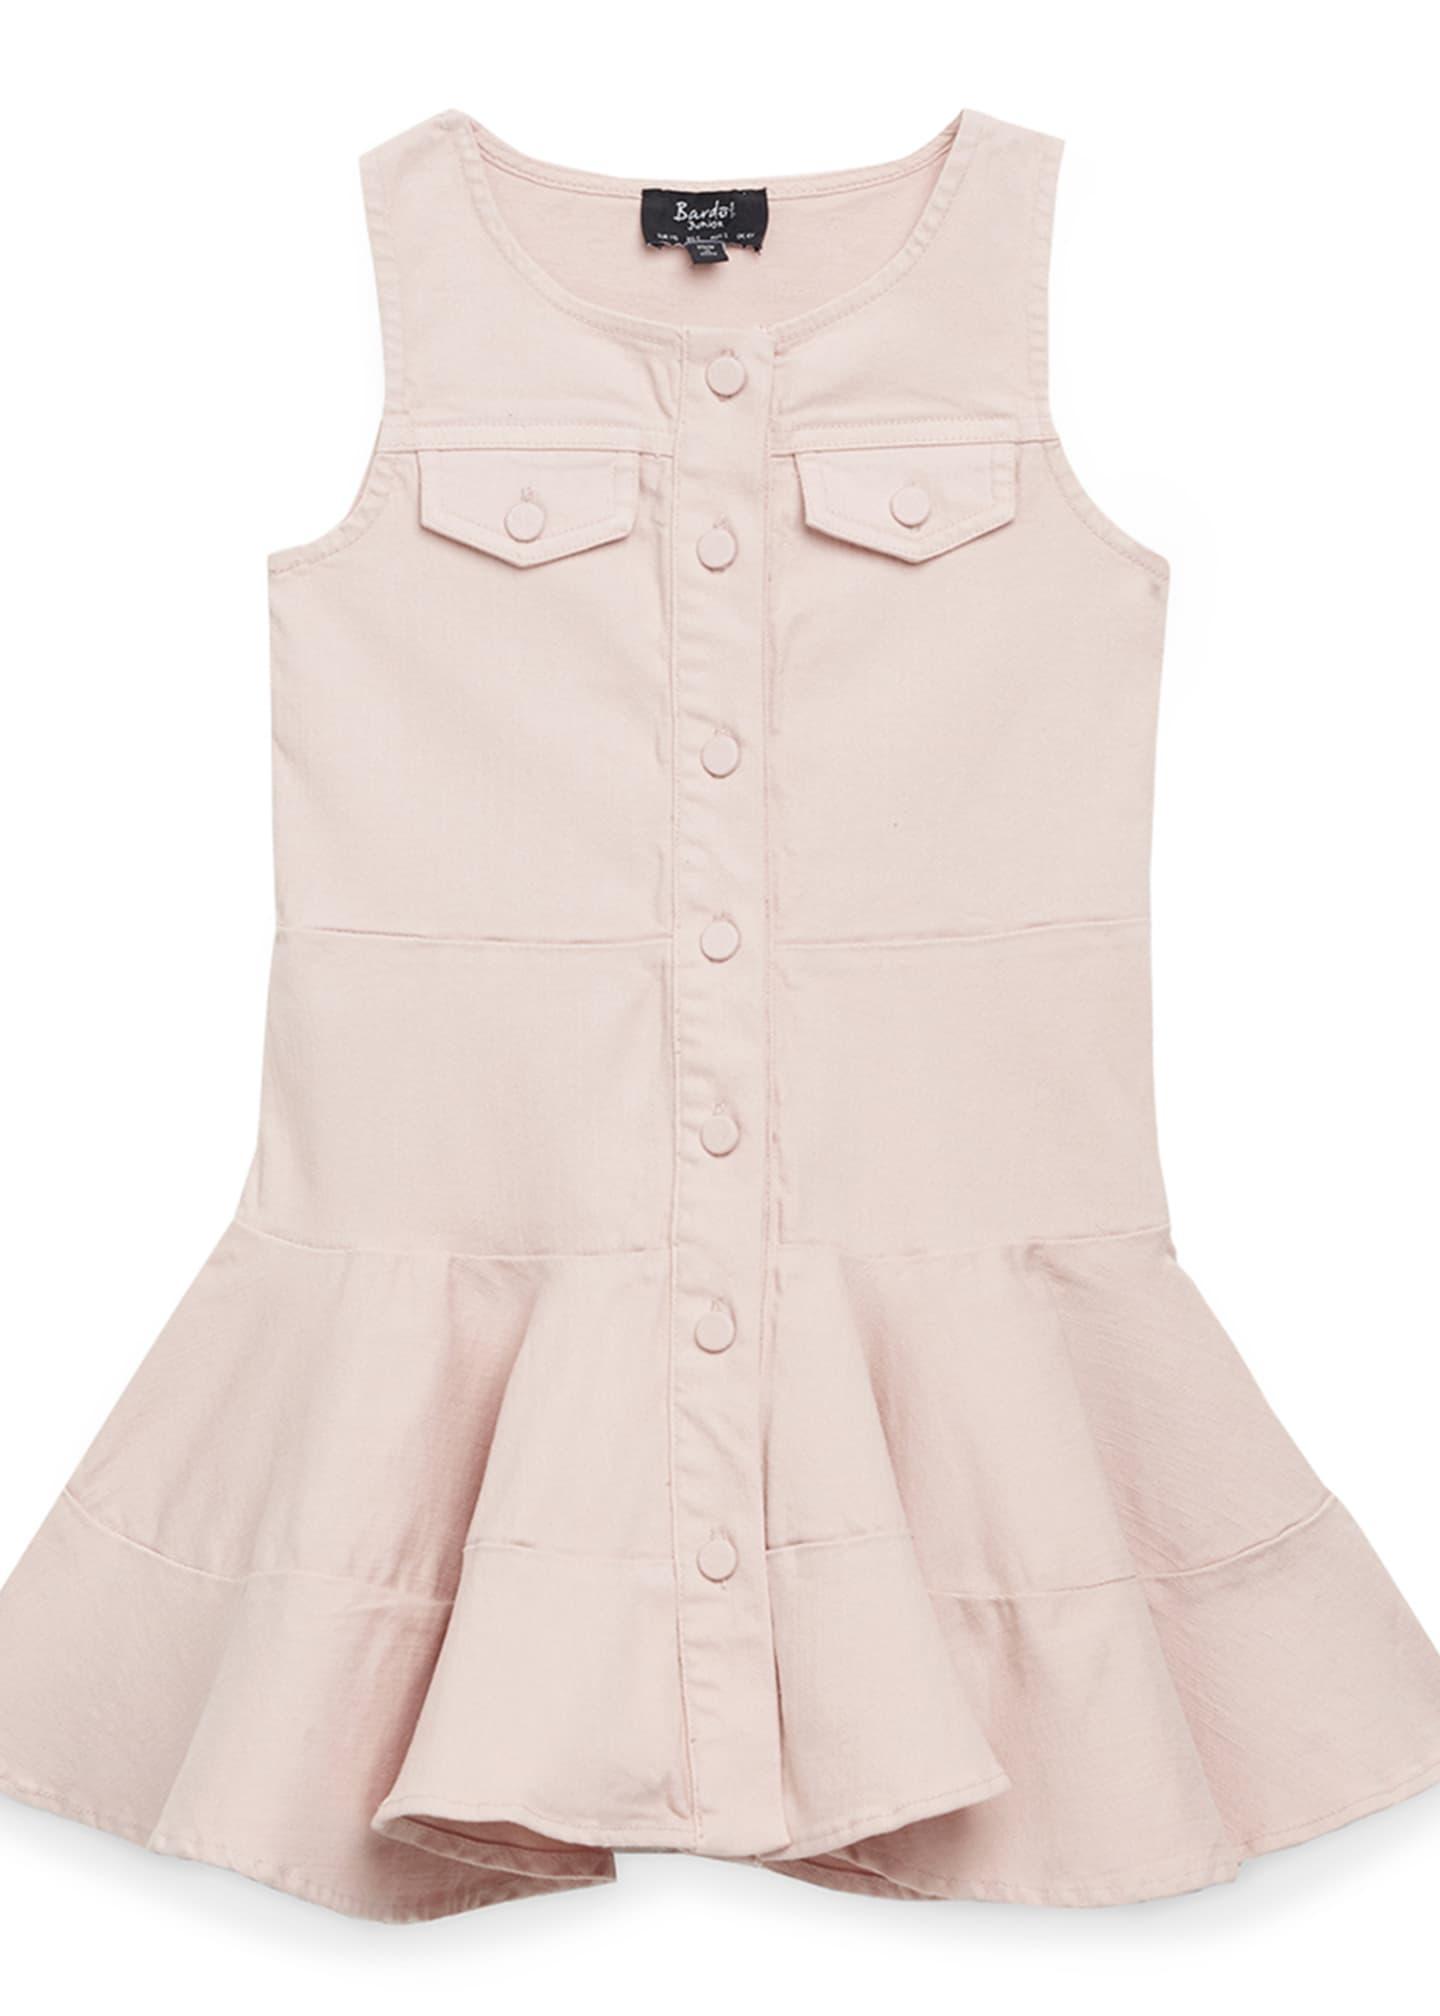 Bardot Junior Alice Button-Front Colored Denim Dress, Size